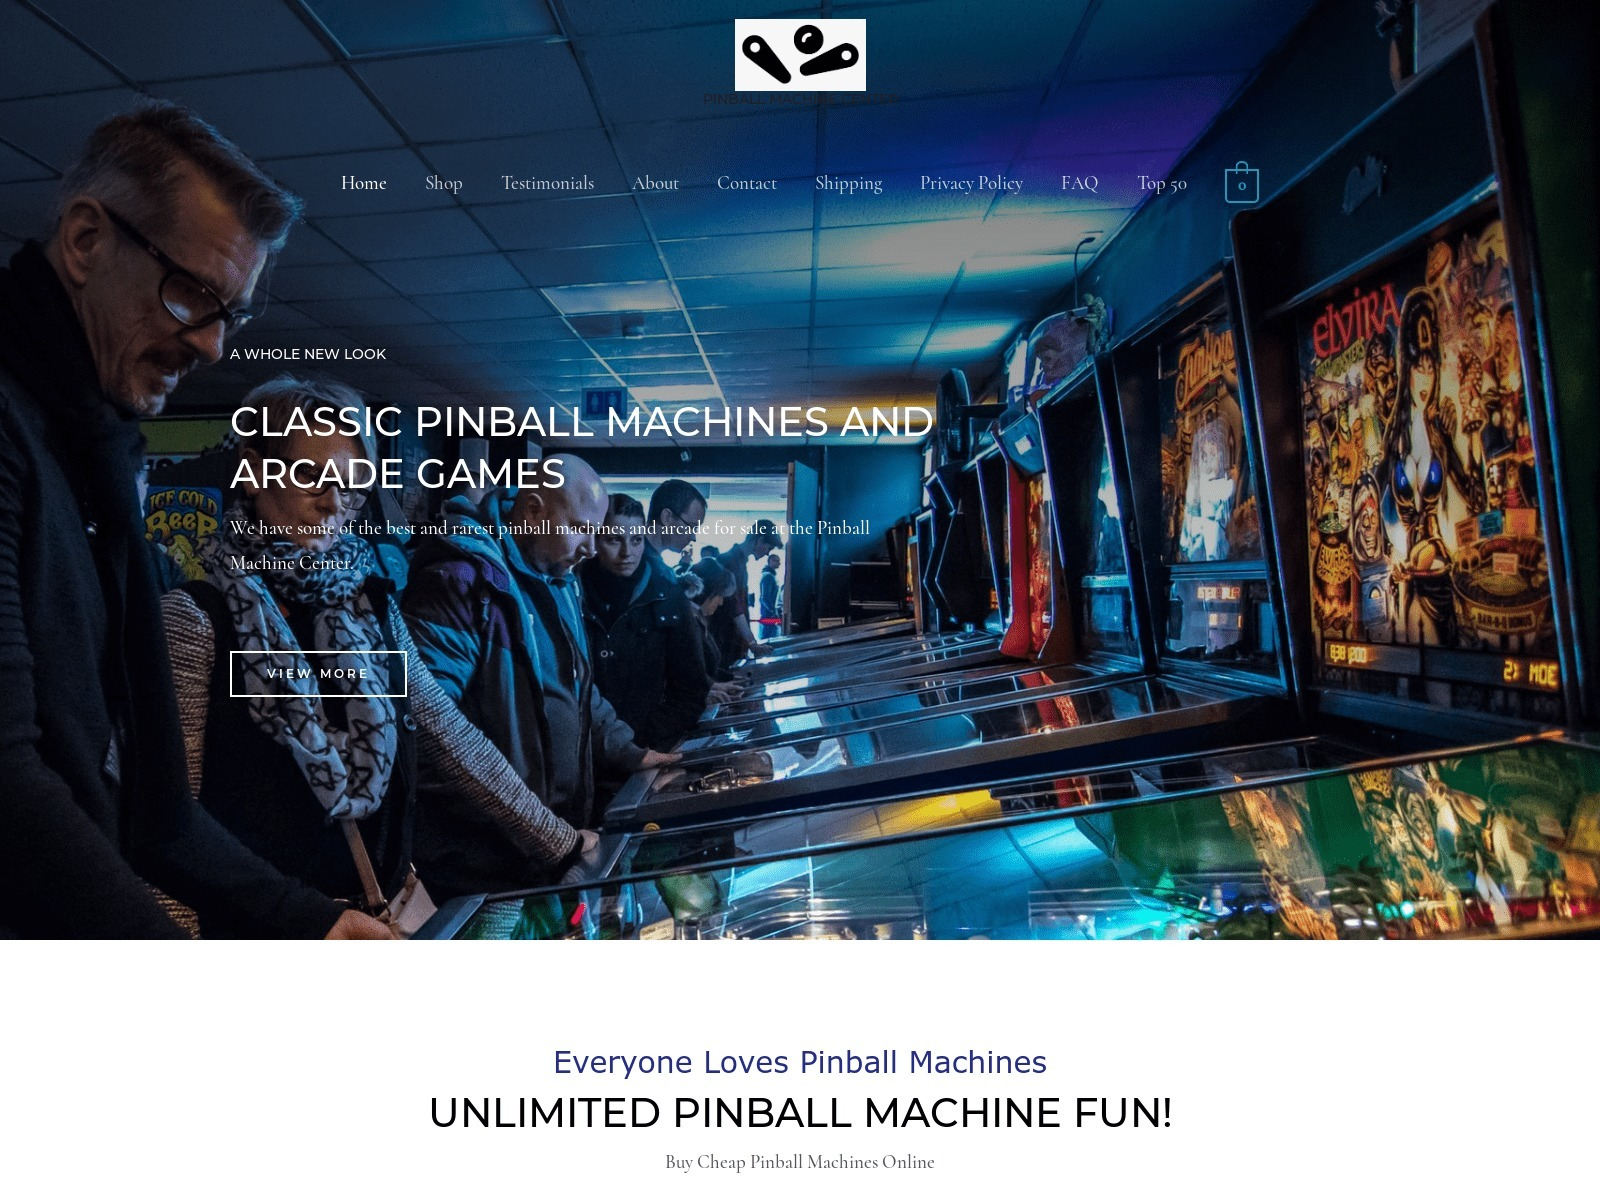 Worldwide Arcade Game Machines For Sale  (@pinballmachine) Cover Image